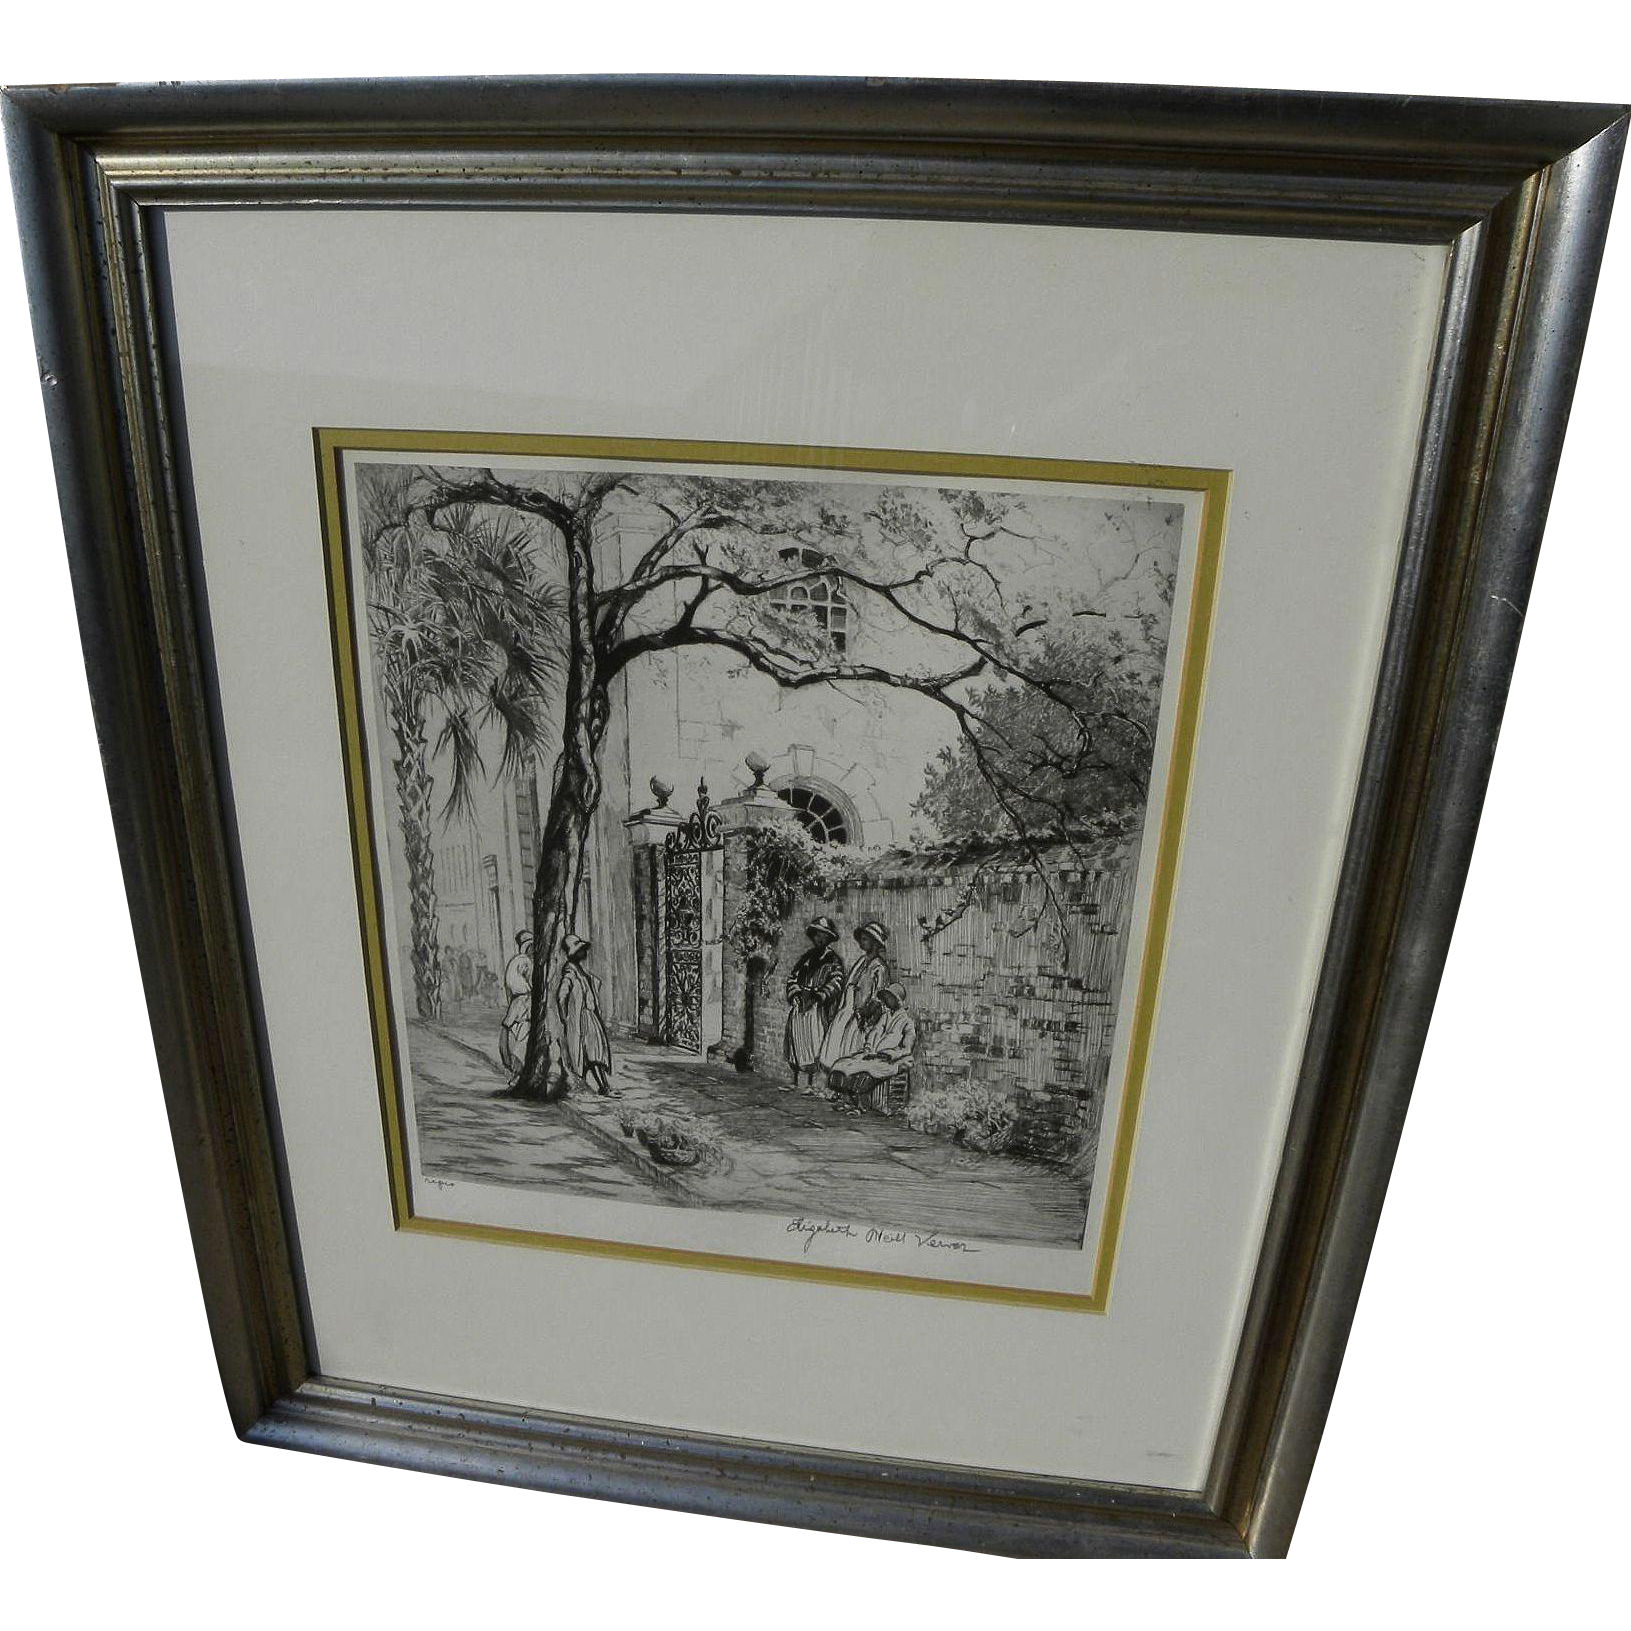 "ELIZABETH O'NEILL VERNER (1883-1979) South Carolina art print ""Springtime in Charleston"" pencil signed"